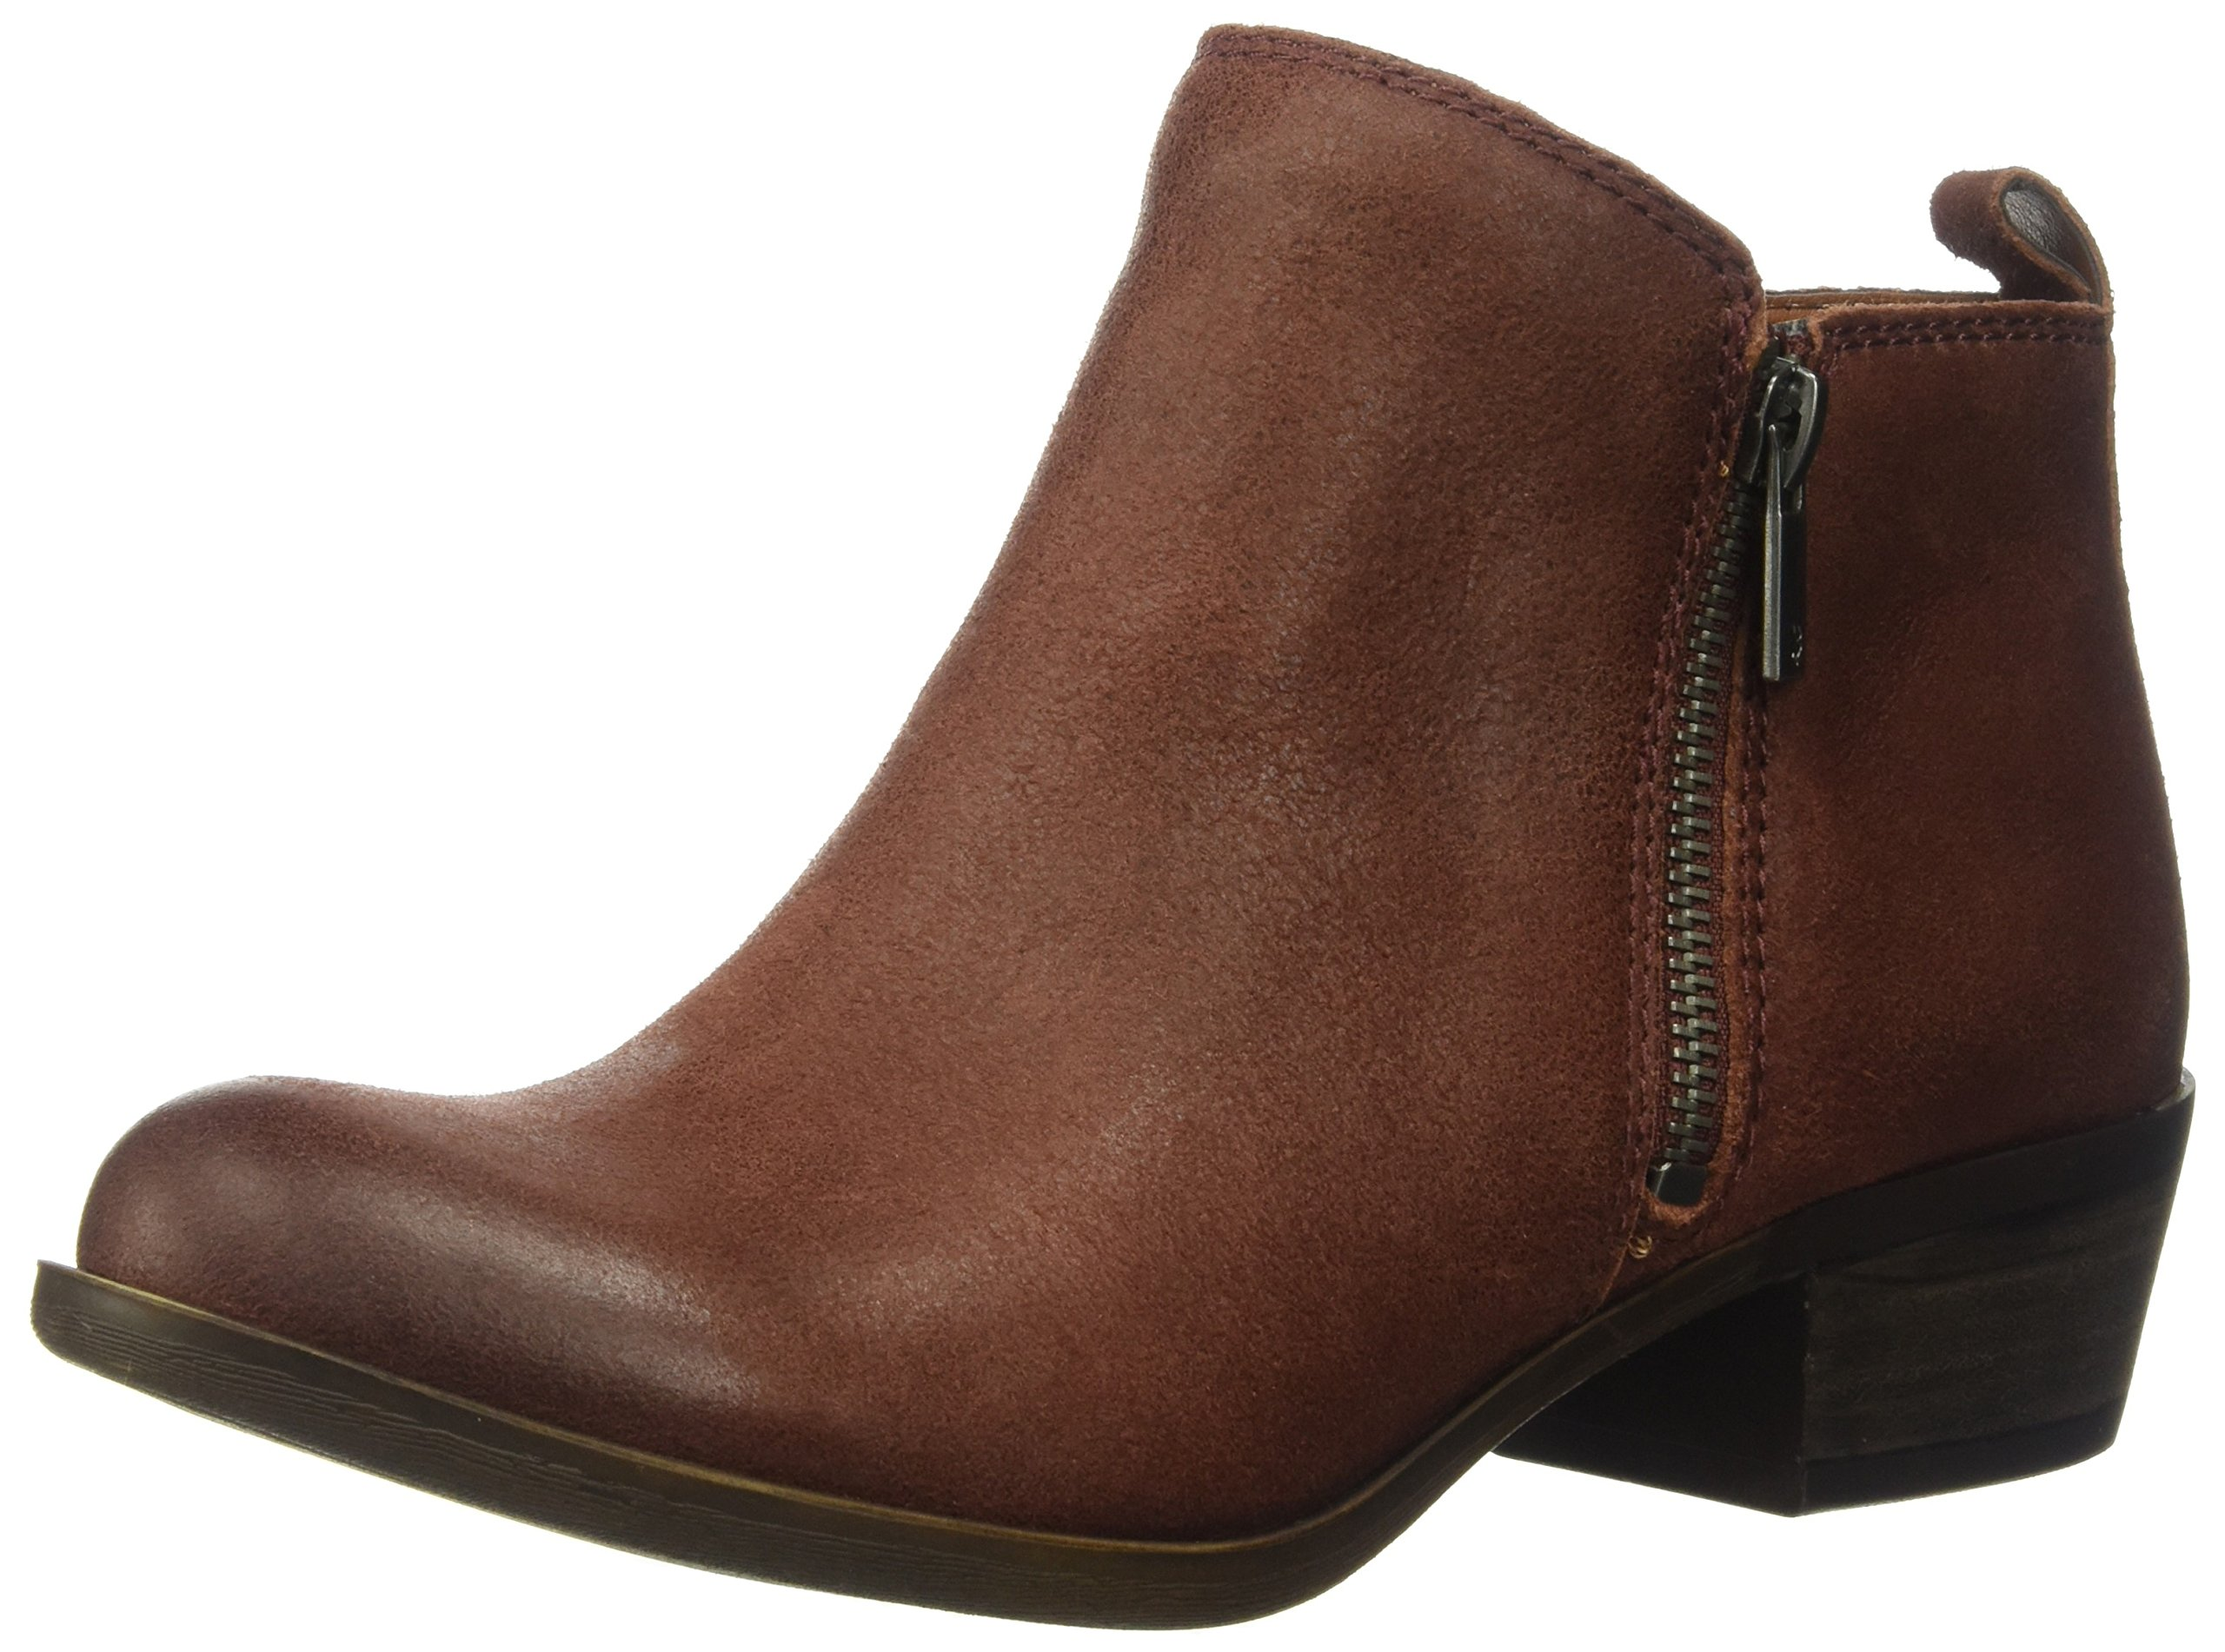 Lucky Women's LK-Basel Ankle Boot, Sable, 7.5 Medium US